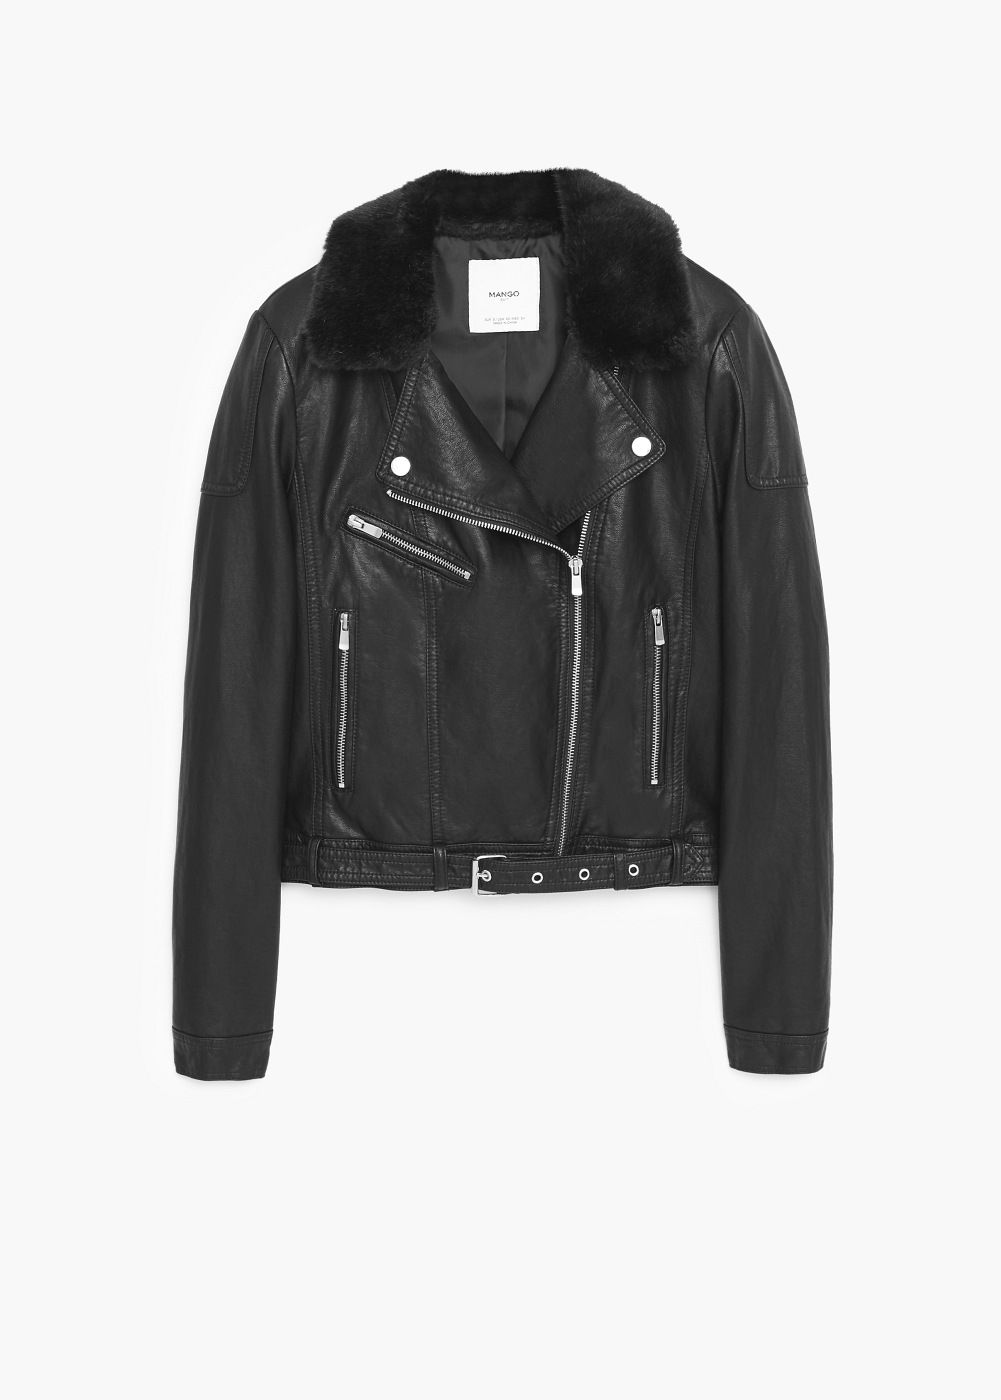 Jacket Women Blouson Pinterest Aviator Style Zip Loves w8aqAUUZx